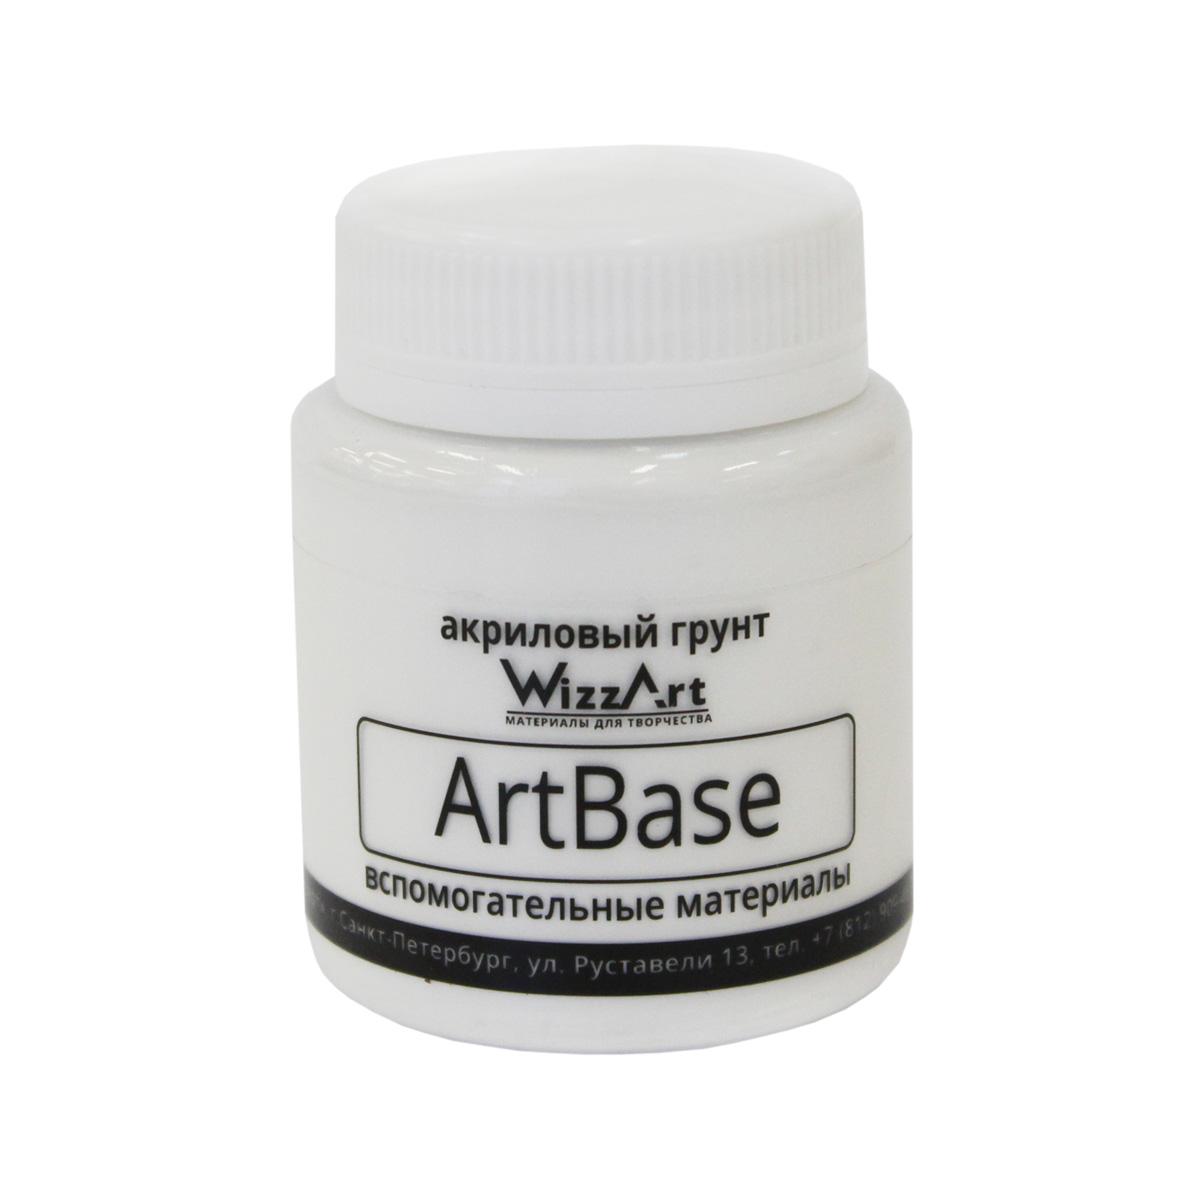 Грунт белый ArtBase 80мл Wizzart